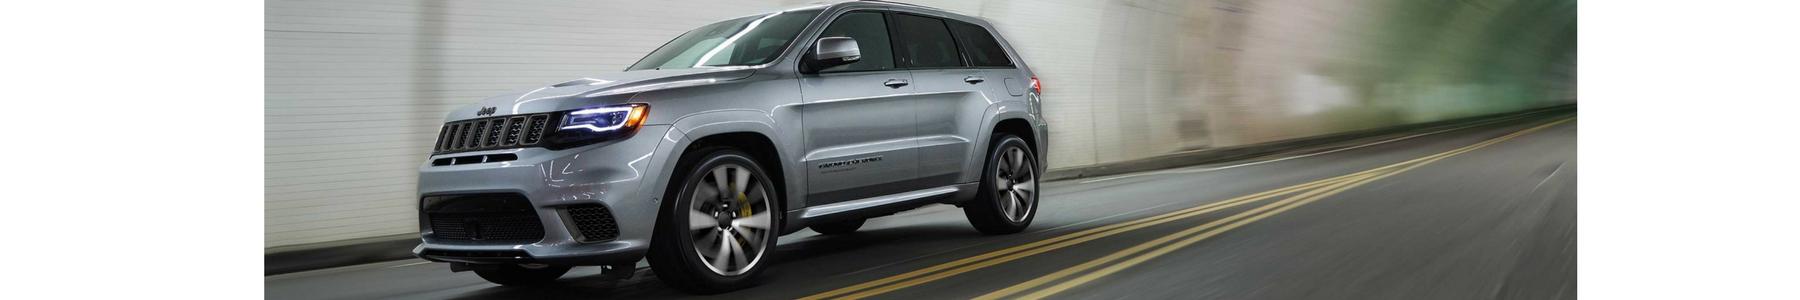 New 2018 Jeep Grand Cherokee for Sale near Kokomo, IN